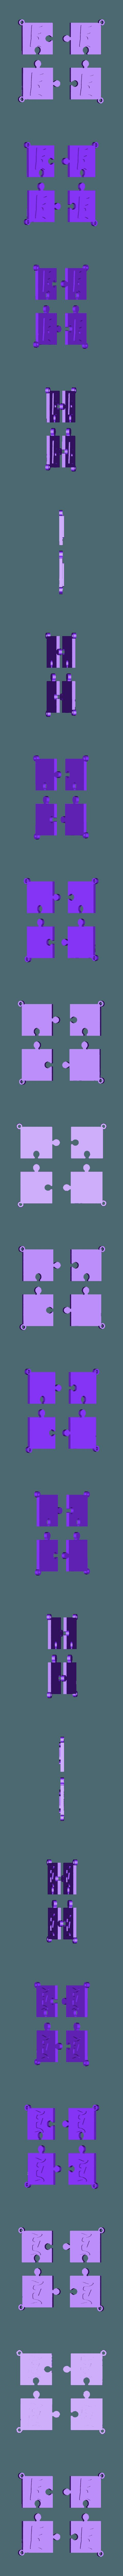 puzzle e.stl Download STL file puzzle key ring • 3D printing design, catf3d